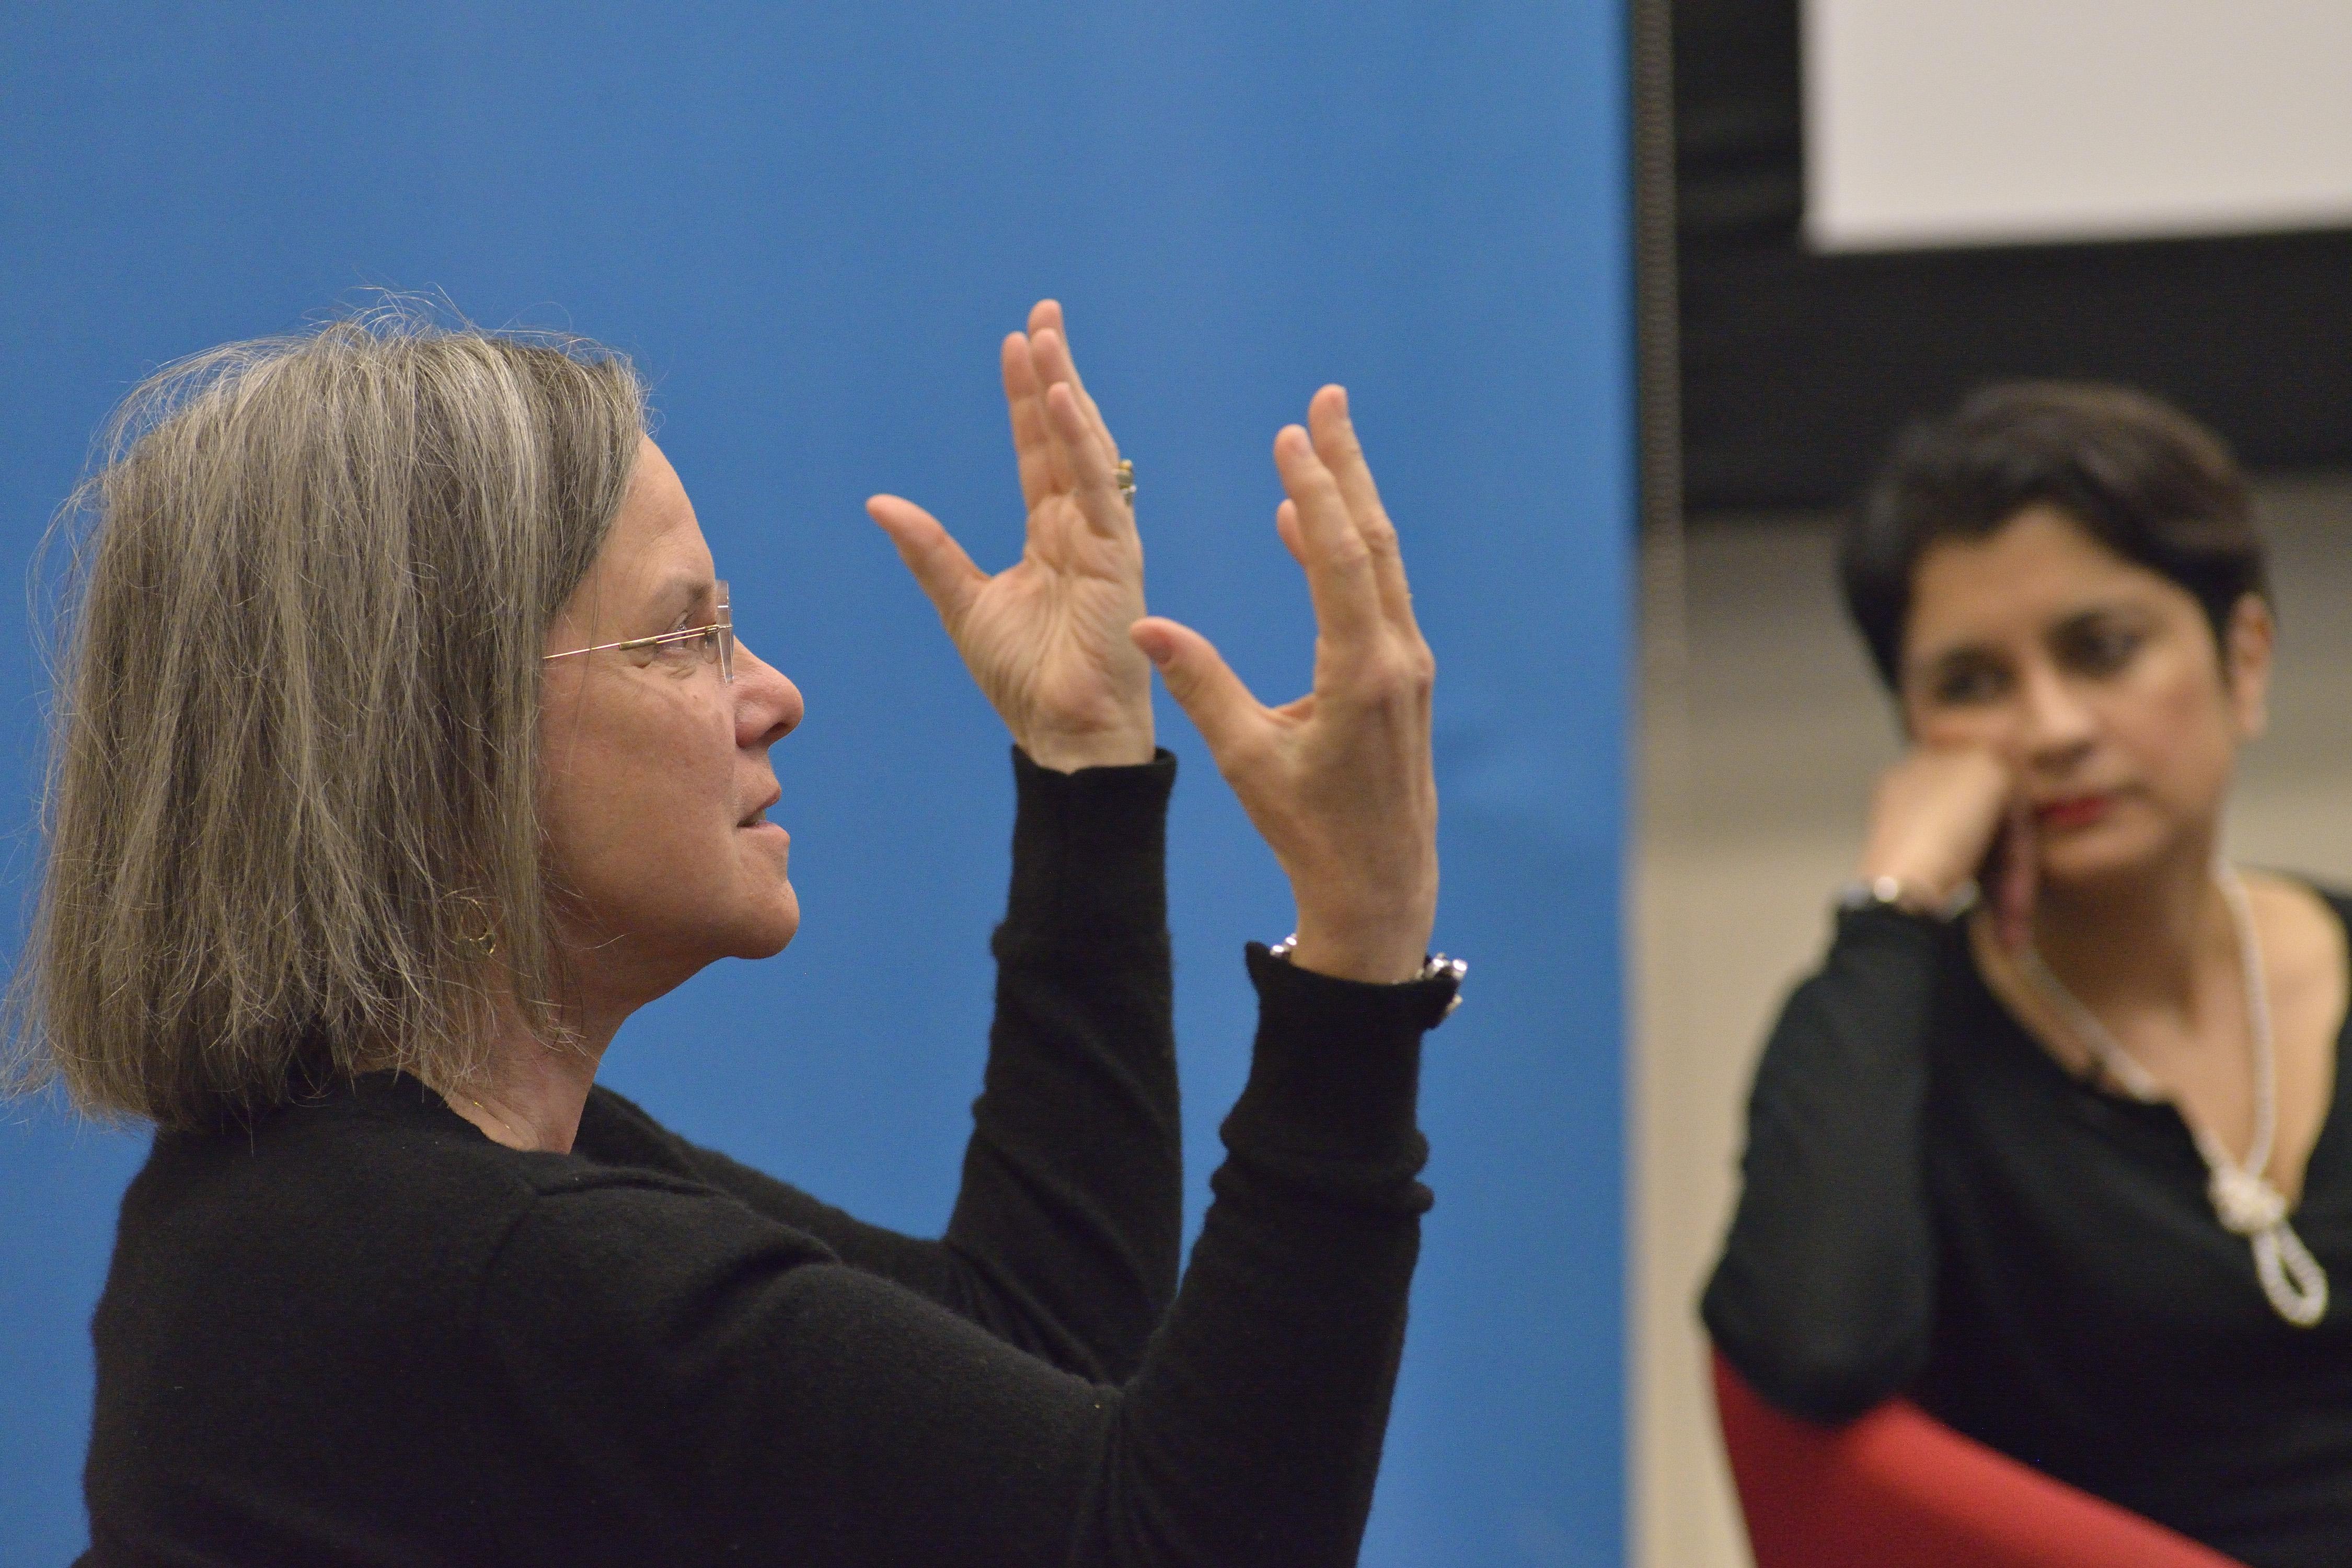 Carolyn Forché in conversation with Shami Chakrabarti. Photo: Jeff Wilson